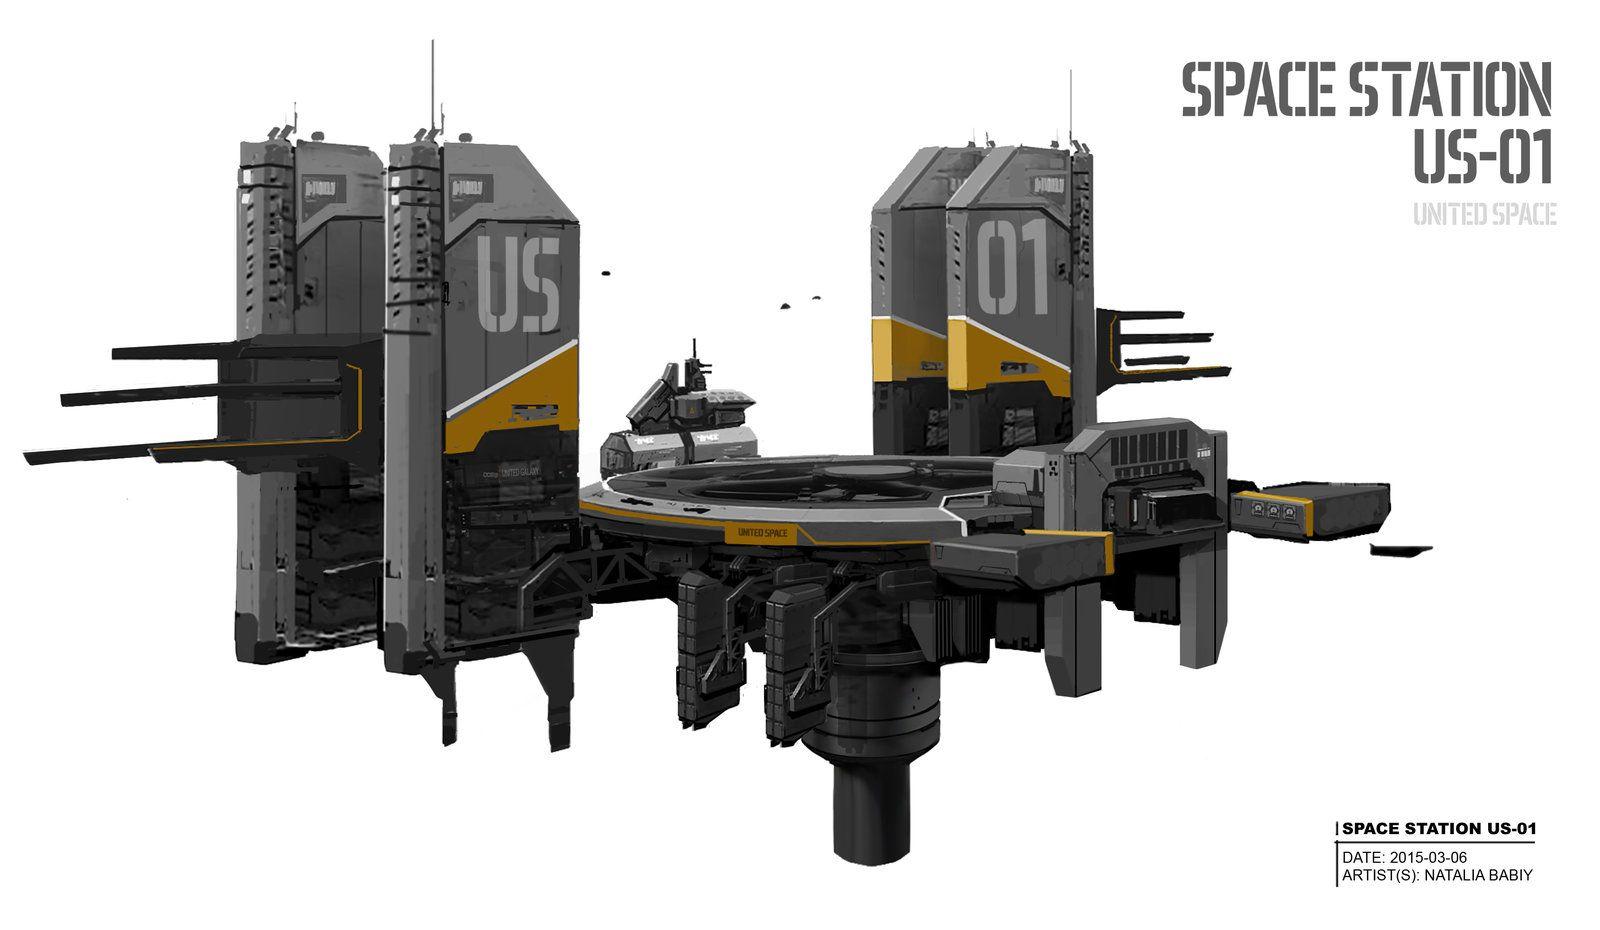 Space station US01 (United Space), Natalia Babiy on